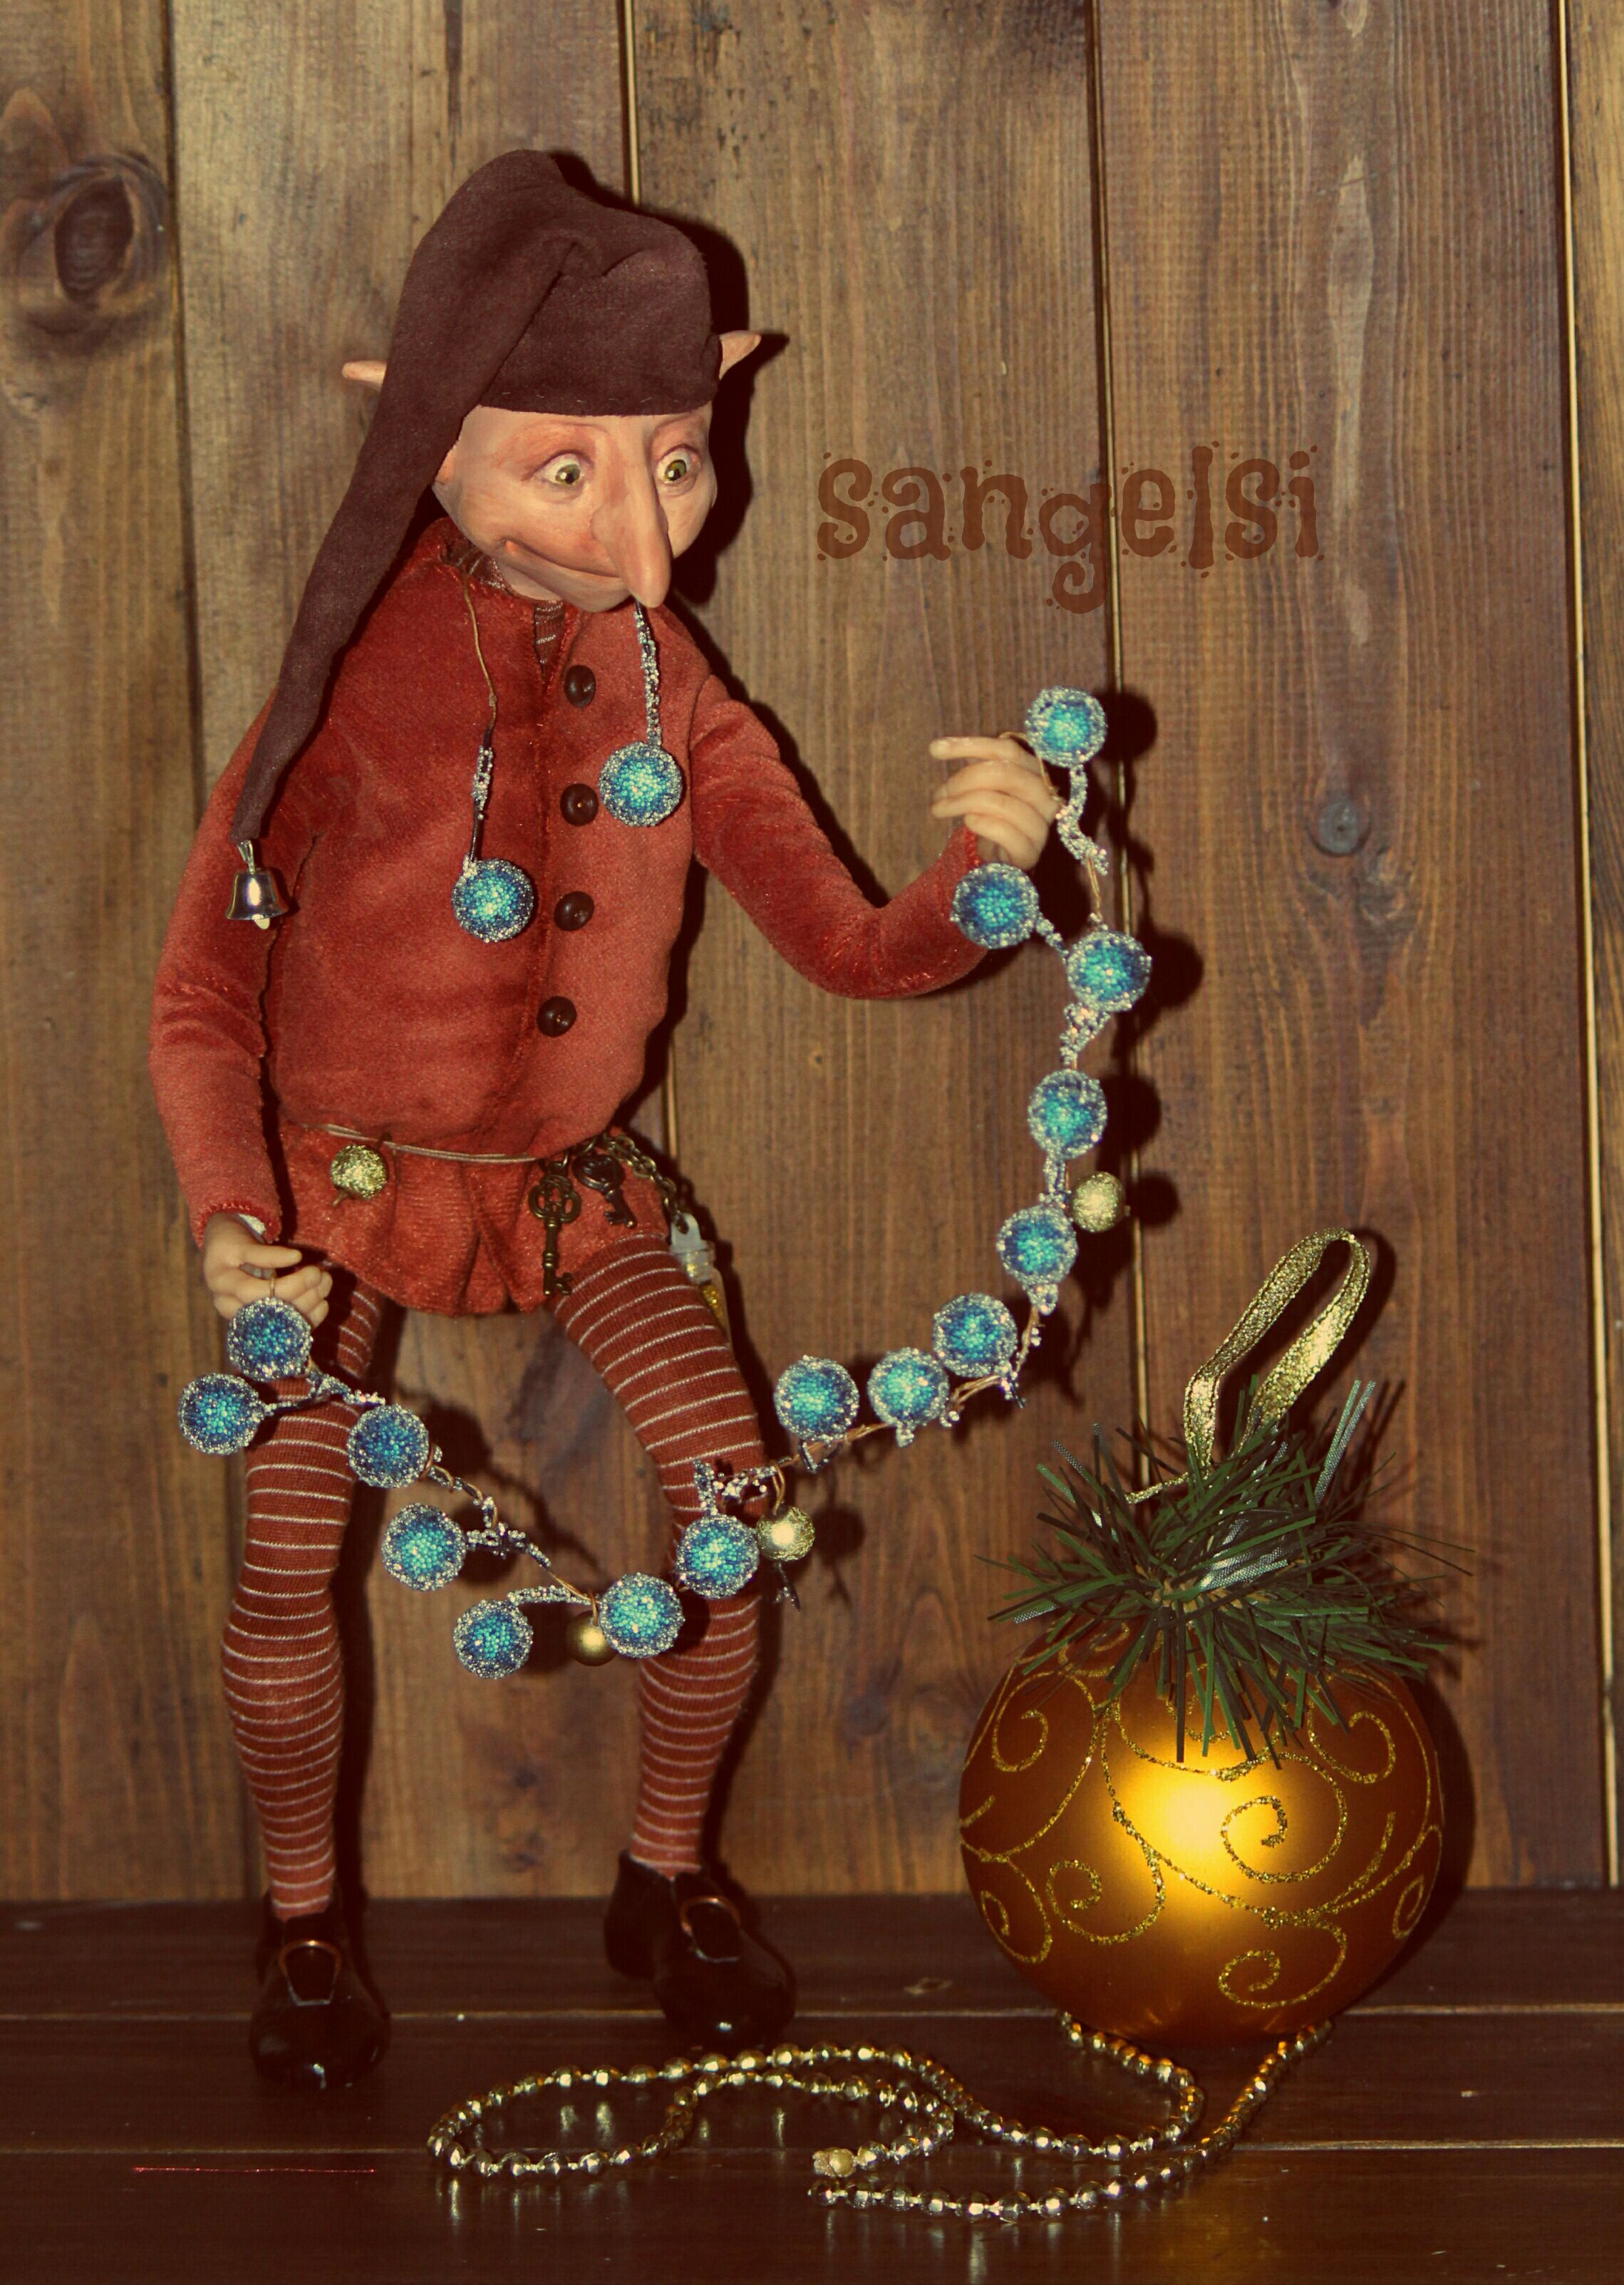 авторскаякукла олелукойе кукласказочник куклавподарок сказка куклаолелукойе сувенир кукла